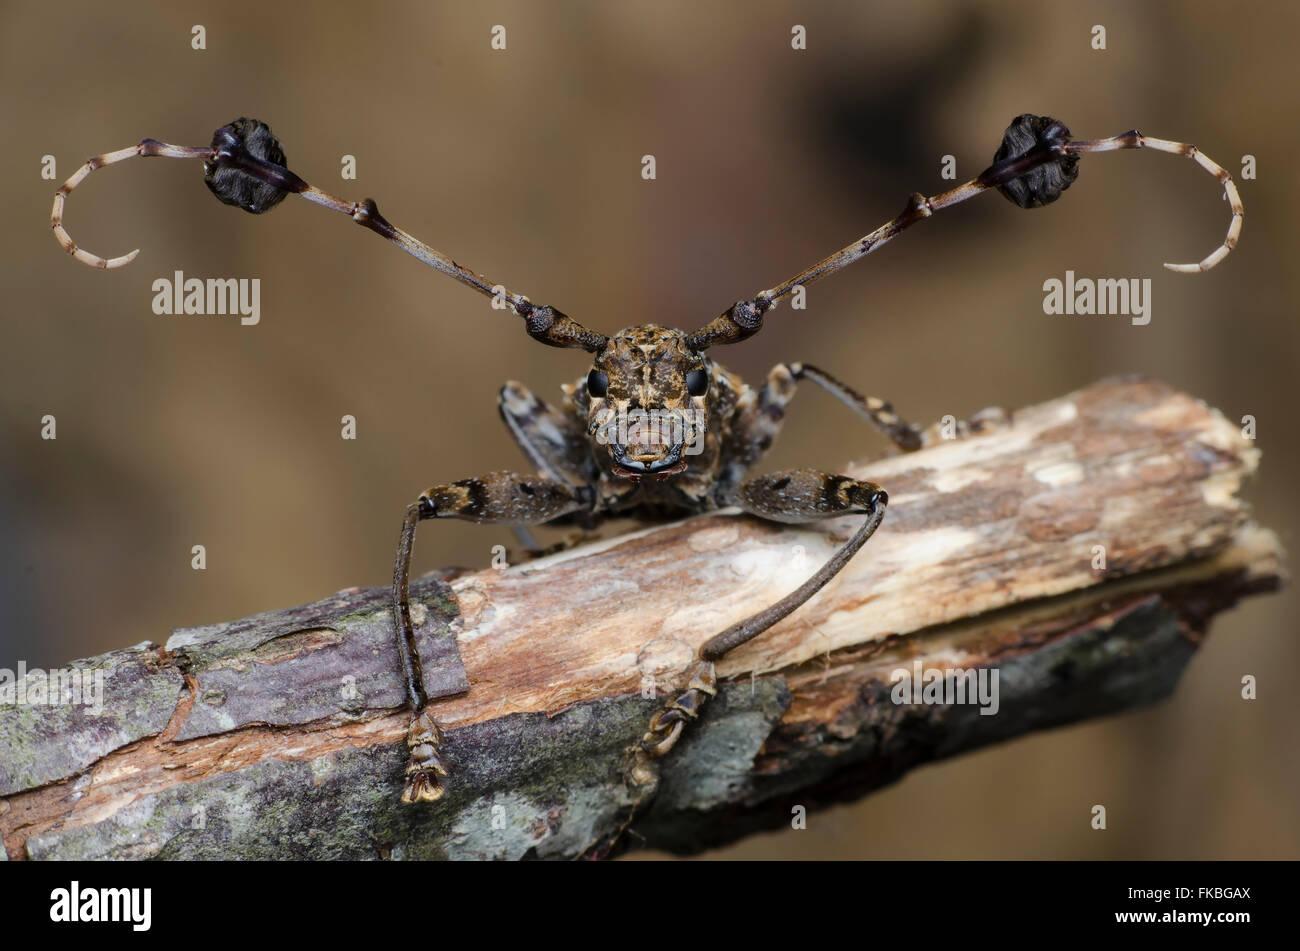 Longhorn beetle Photo Stock